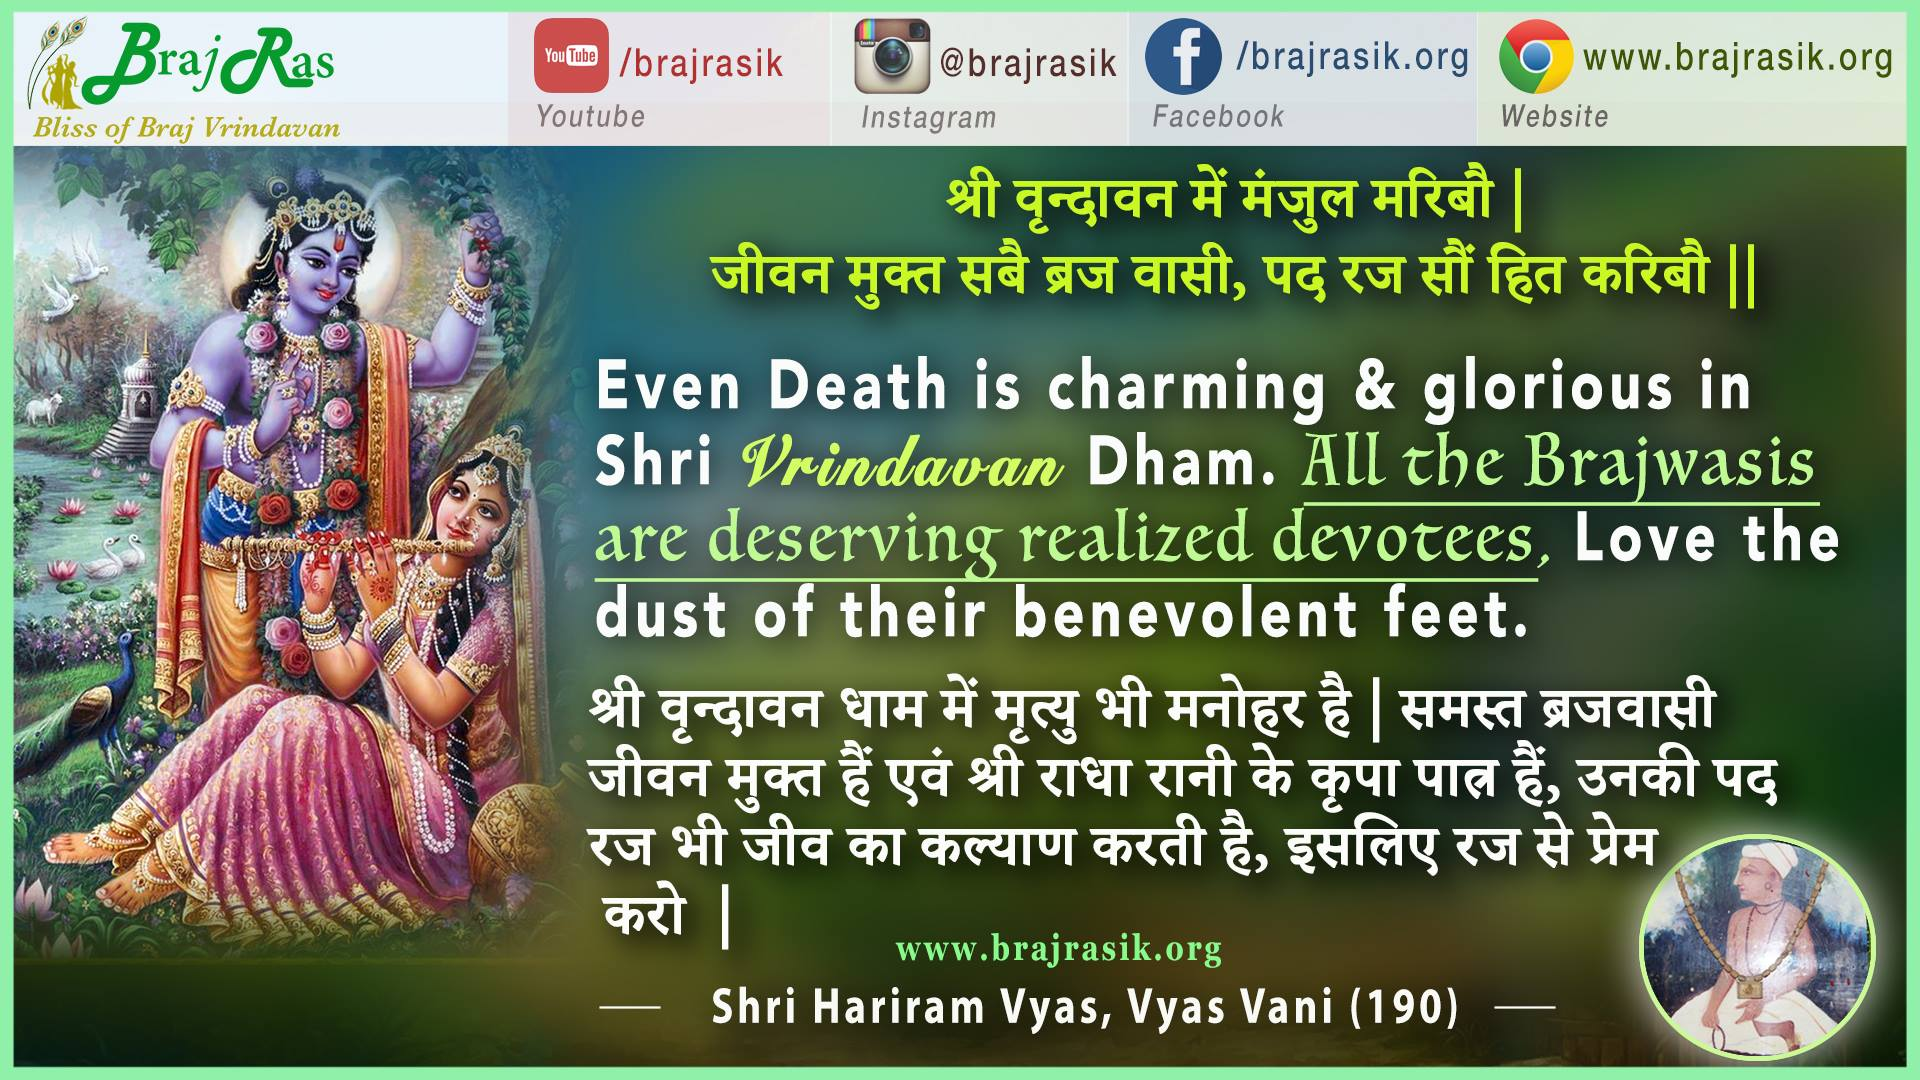 Shri Vrindavan Mein Manjul Maribo -  Shri Hariram Vyas, Vyas Vani